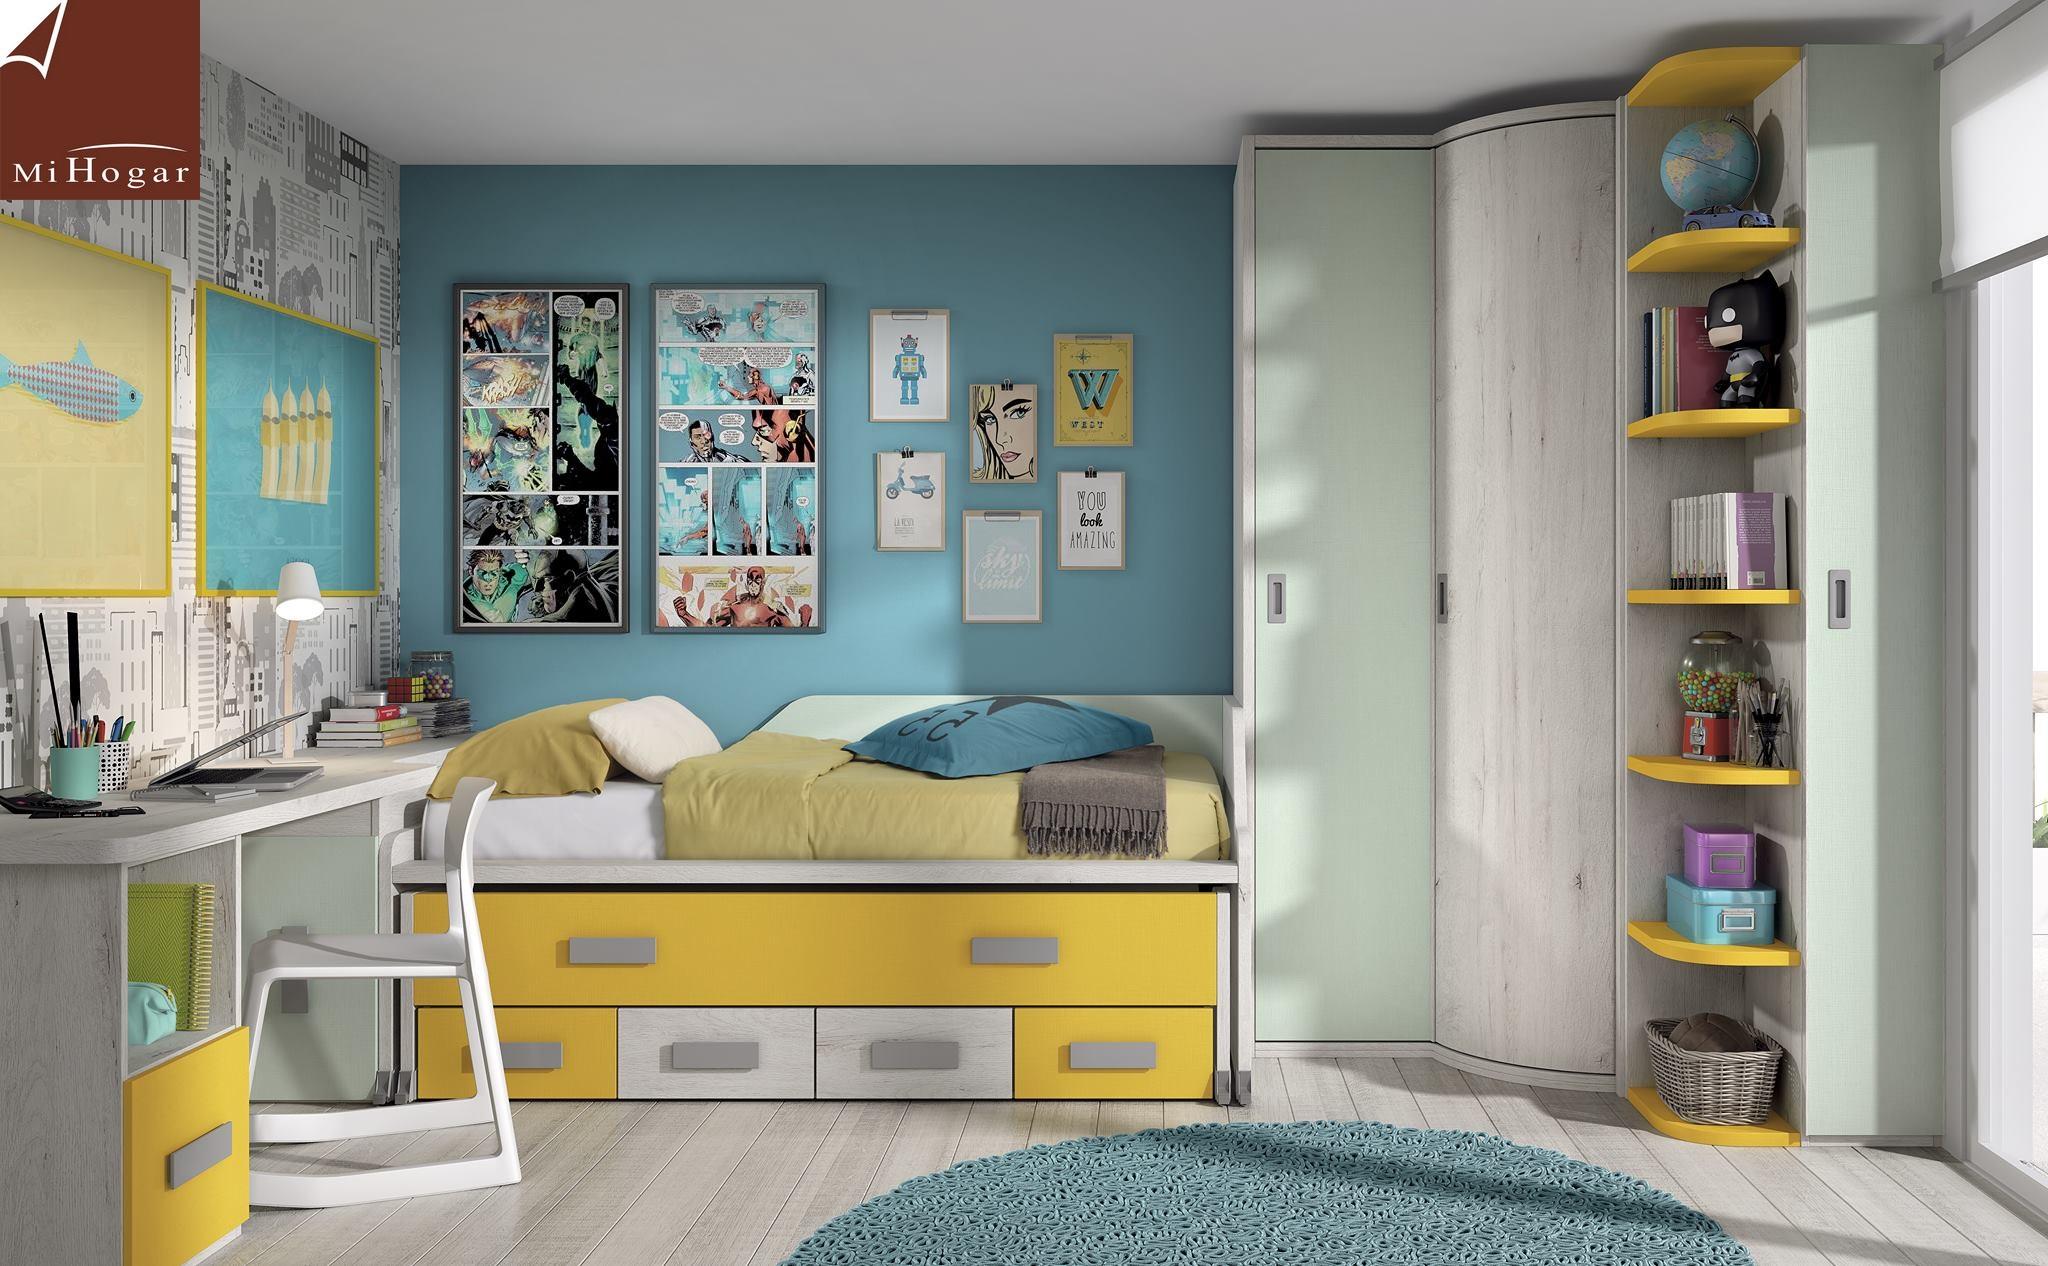 Dormitorios juveniles con dos camas gallery of dormitorio - Decoracion habitacion juvenil masculina ...